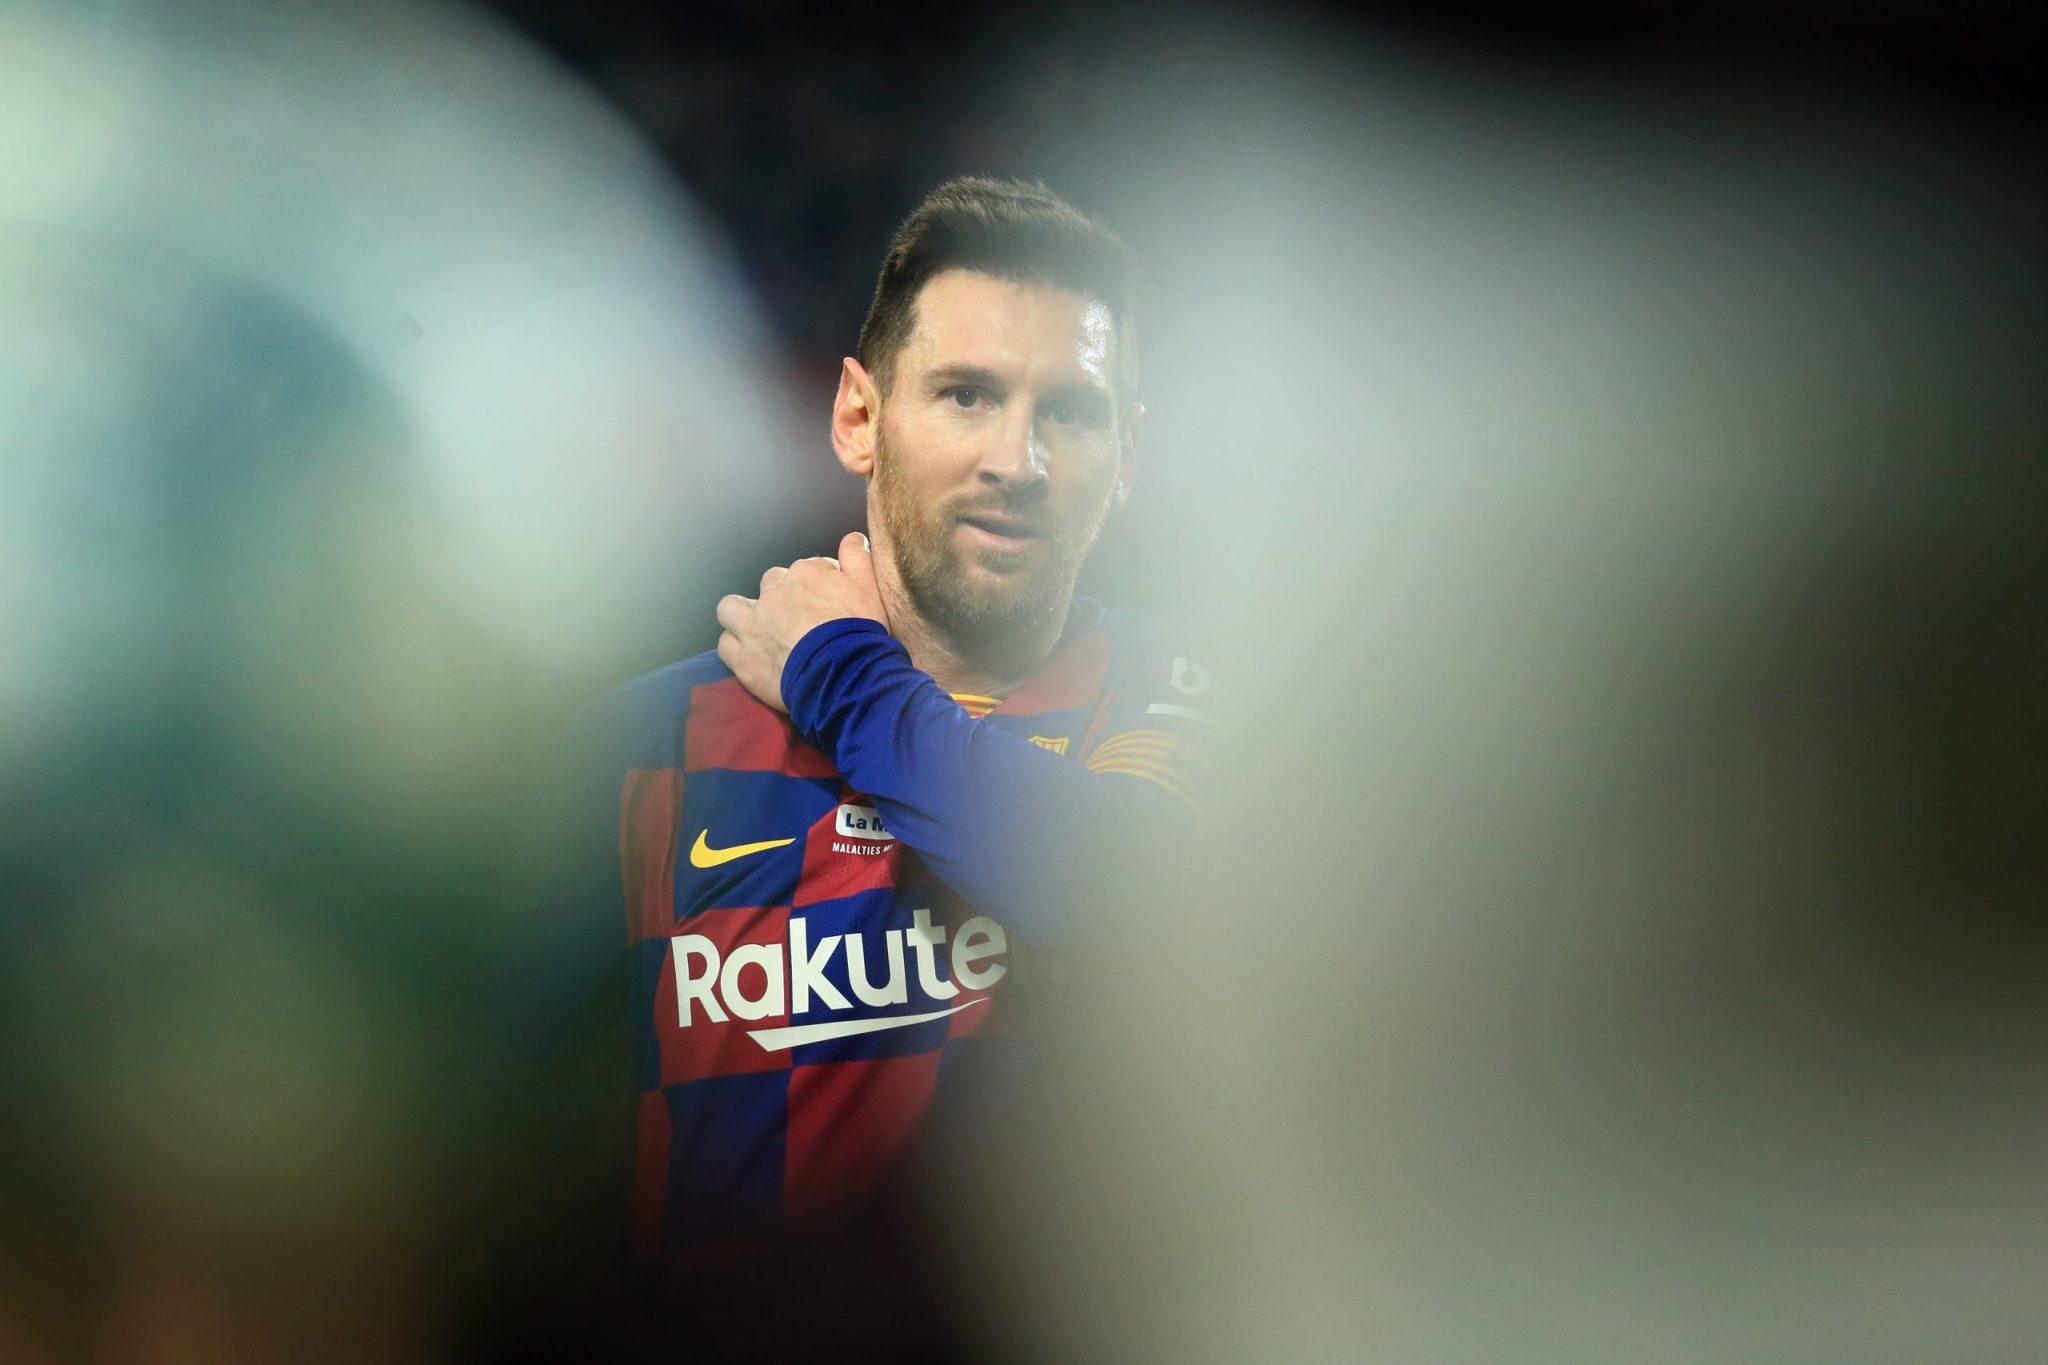 Image courtesy of La Liga